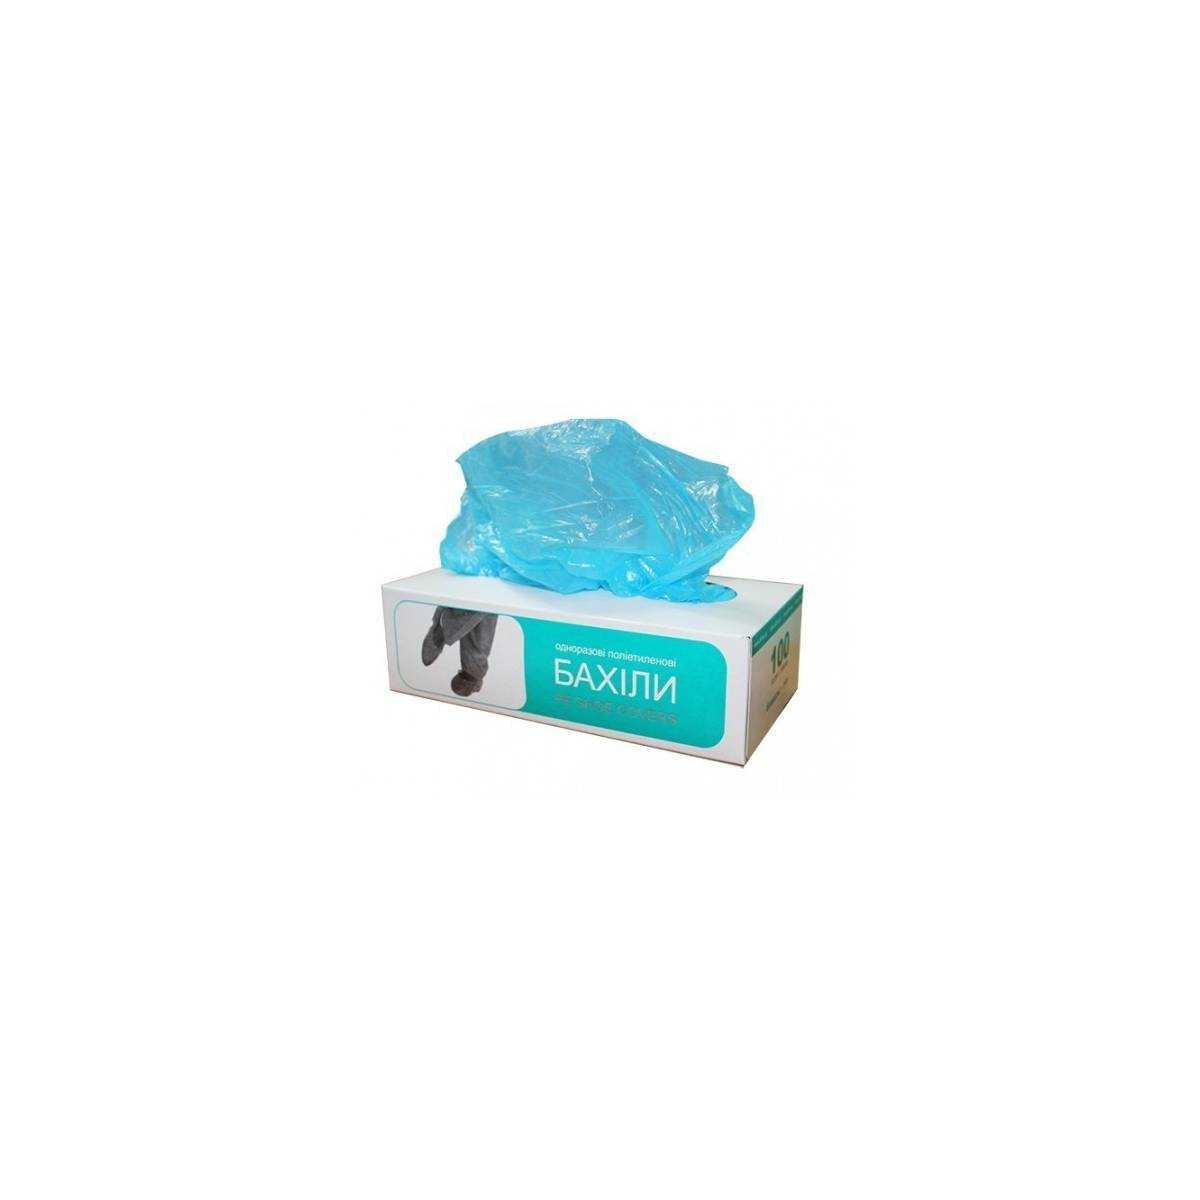 Бахилы для надевания вручную 50 пар BP4016/100 Атма